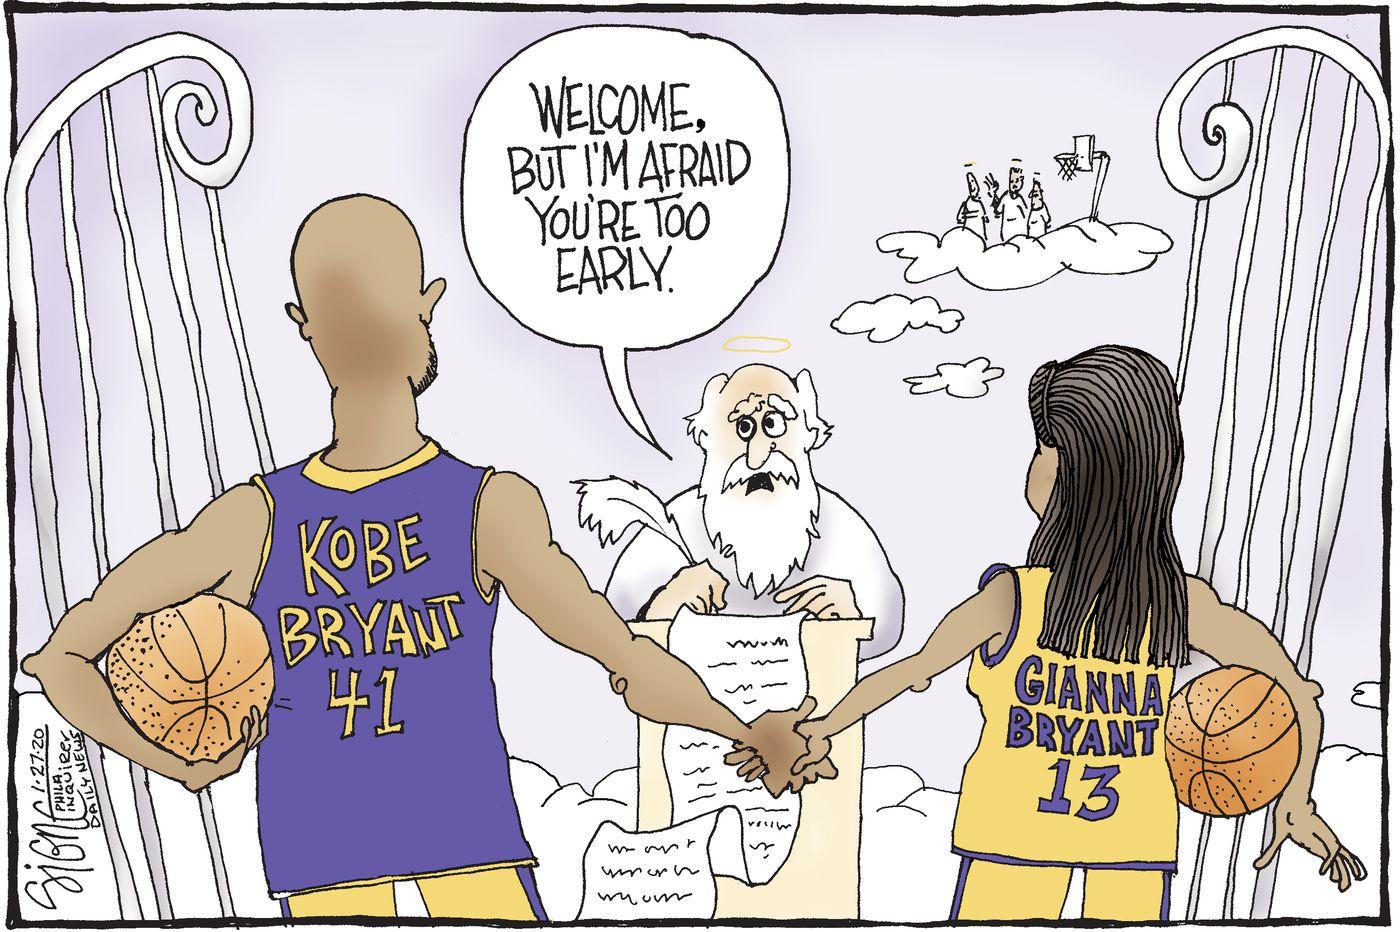 Political Cartoon: Kobe and Gianna Bryant left us too soon